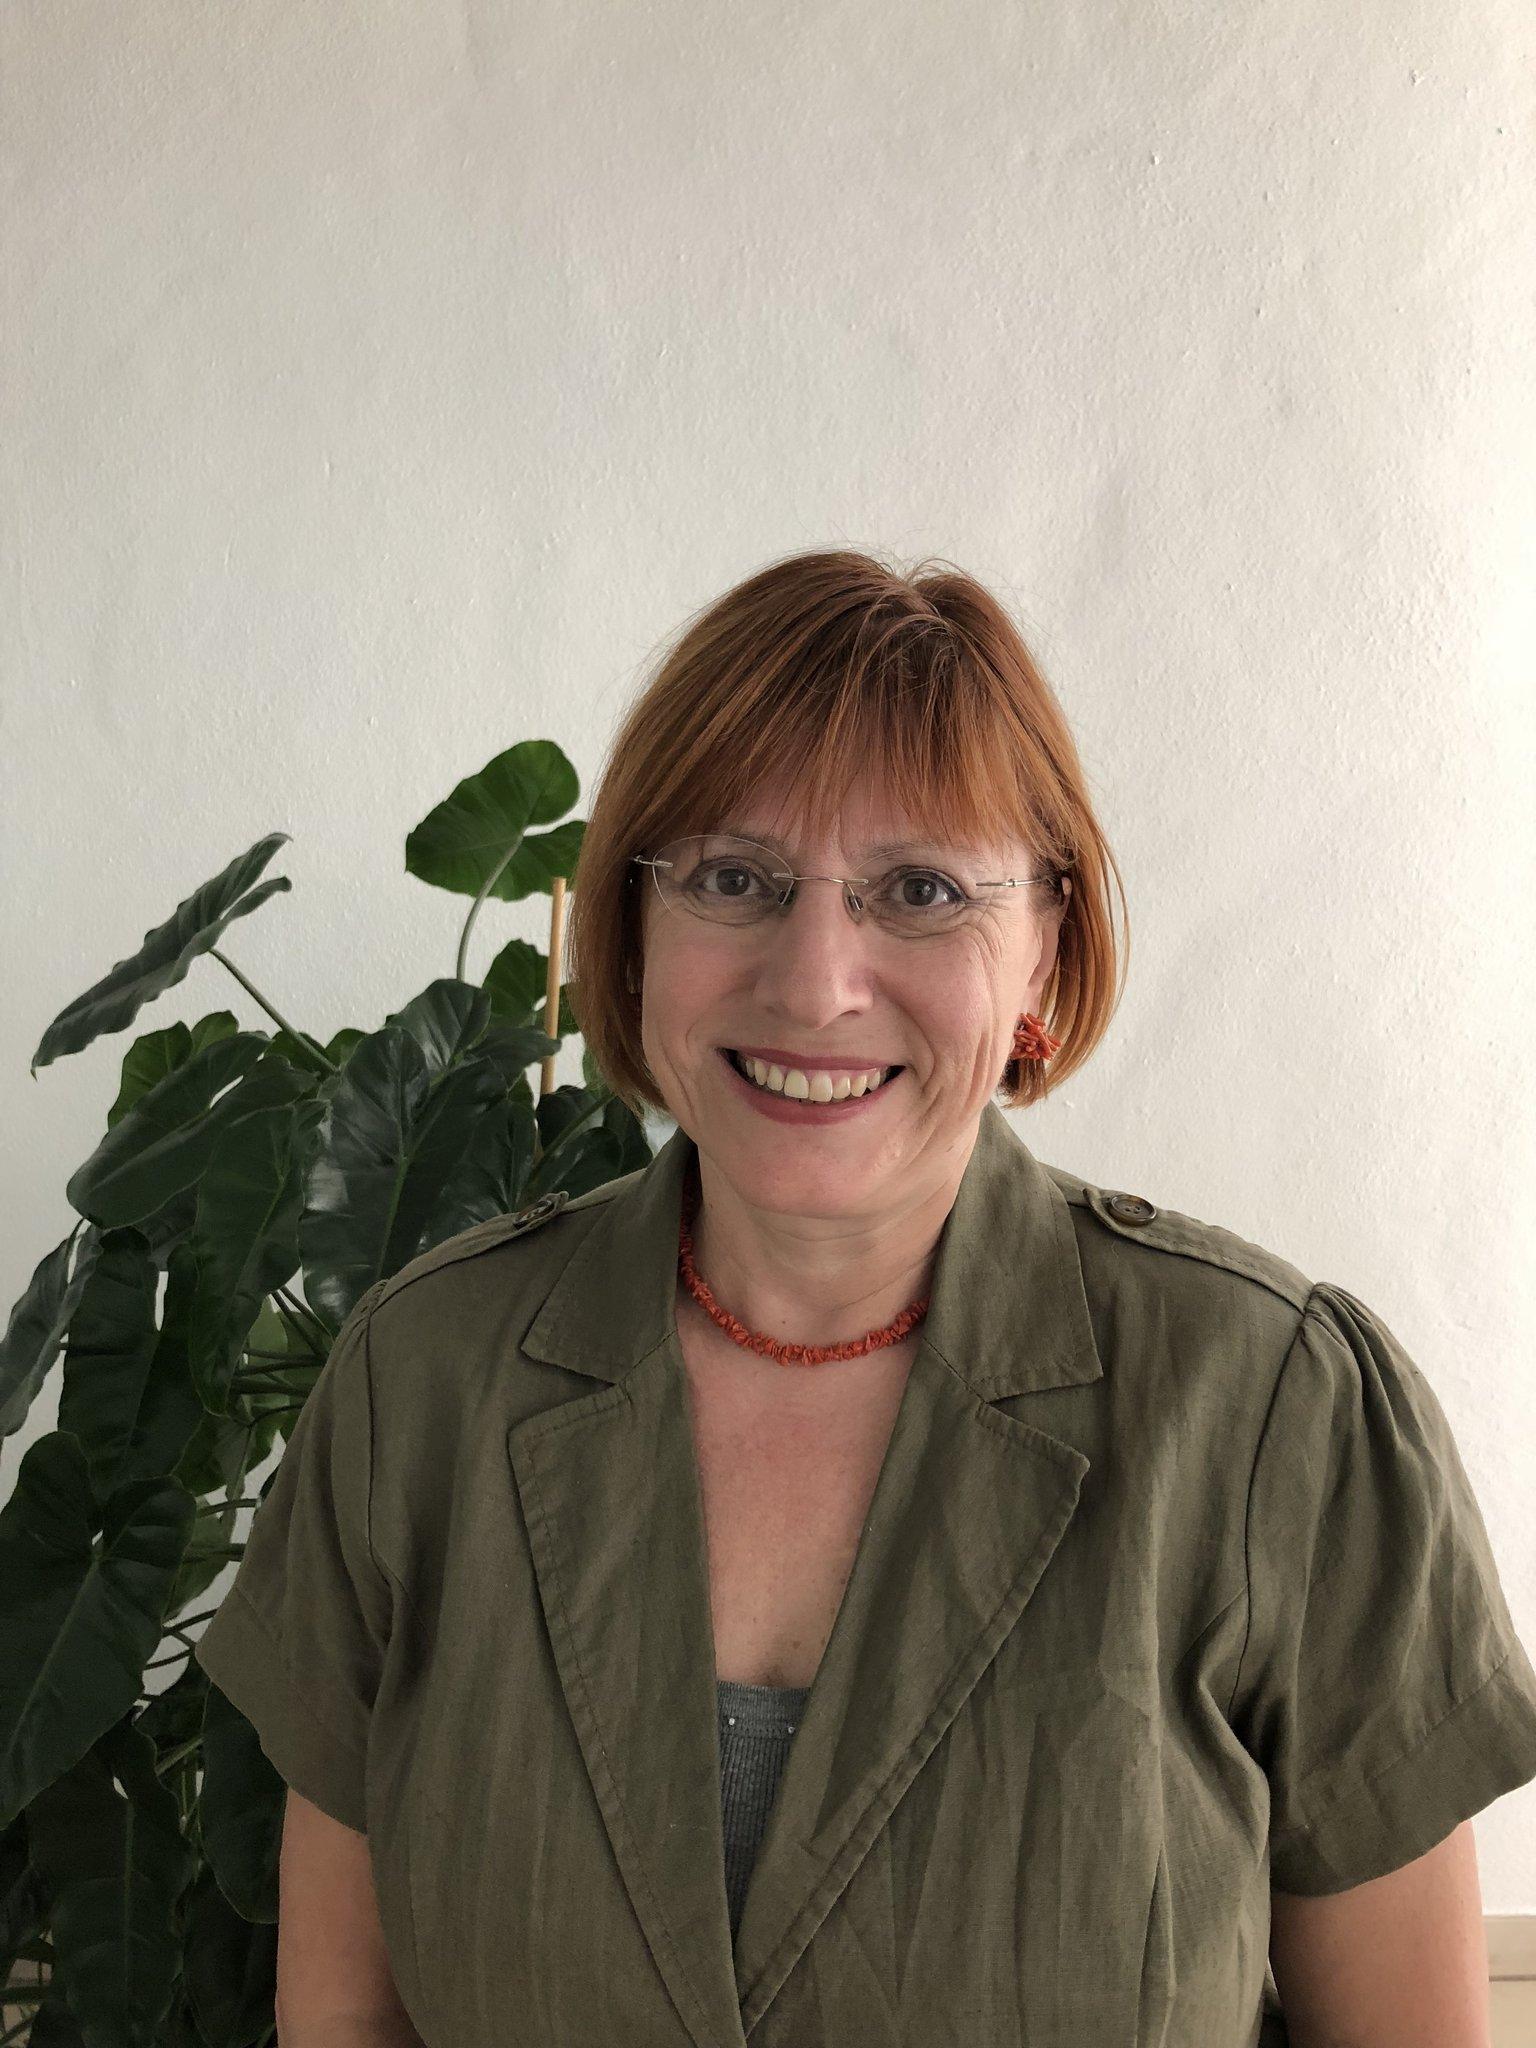 Mann sucht Frau Ottensheim   Locanto Casual Dating